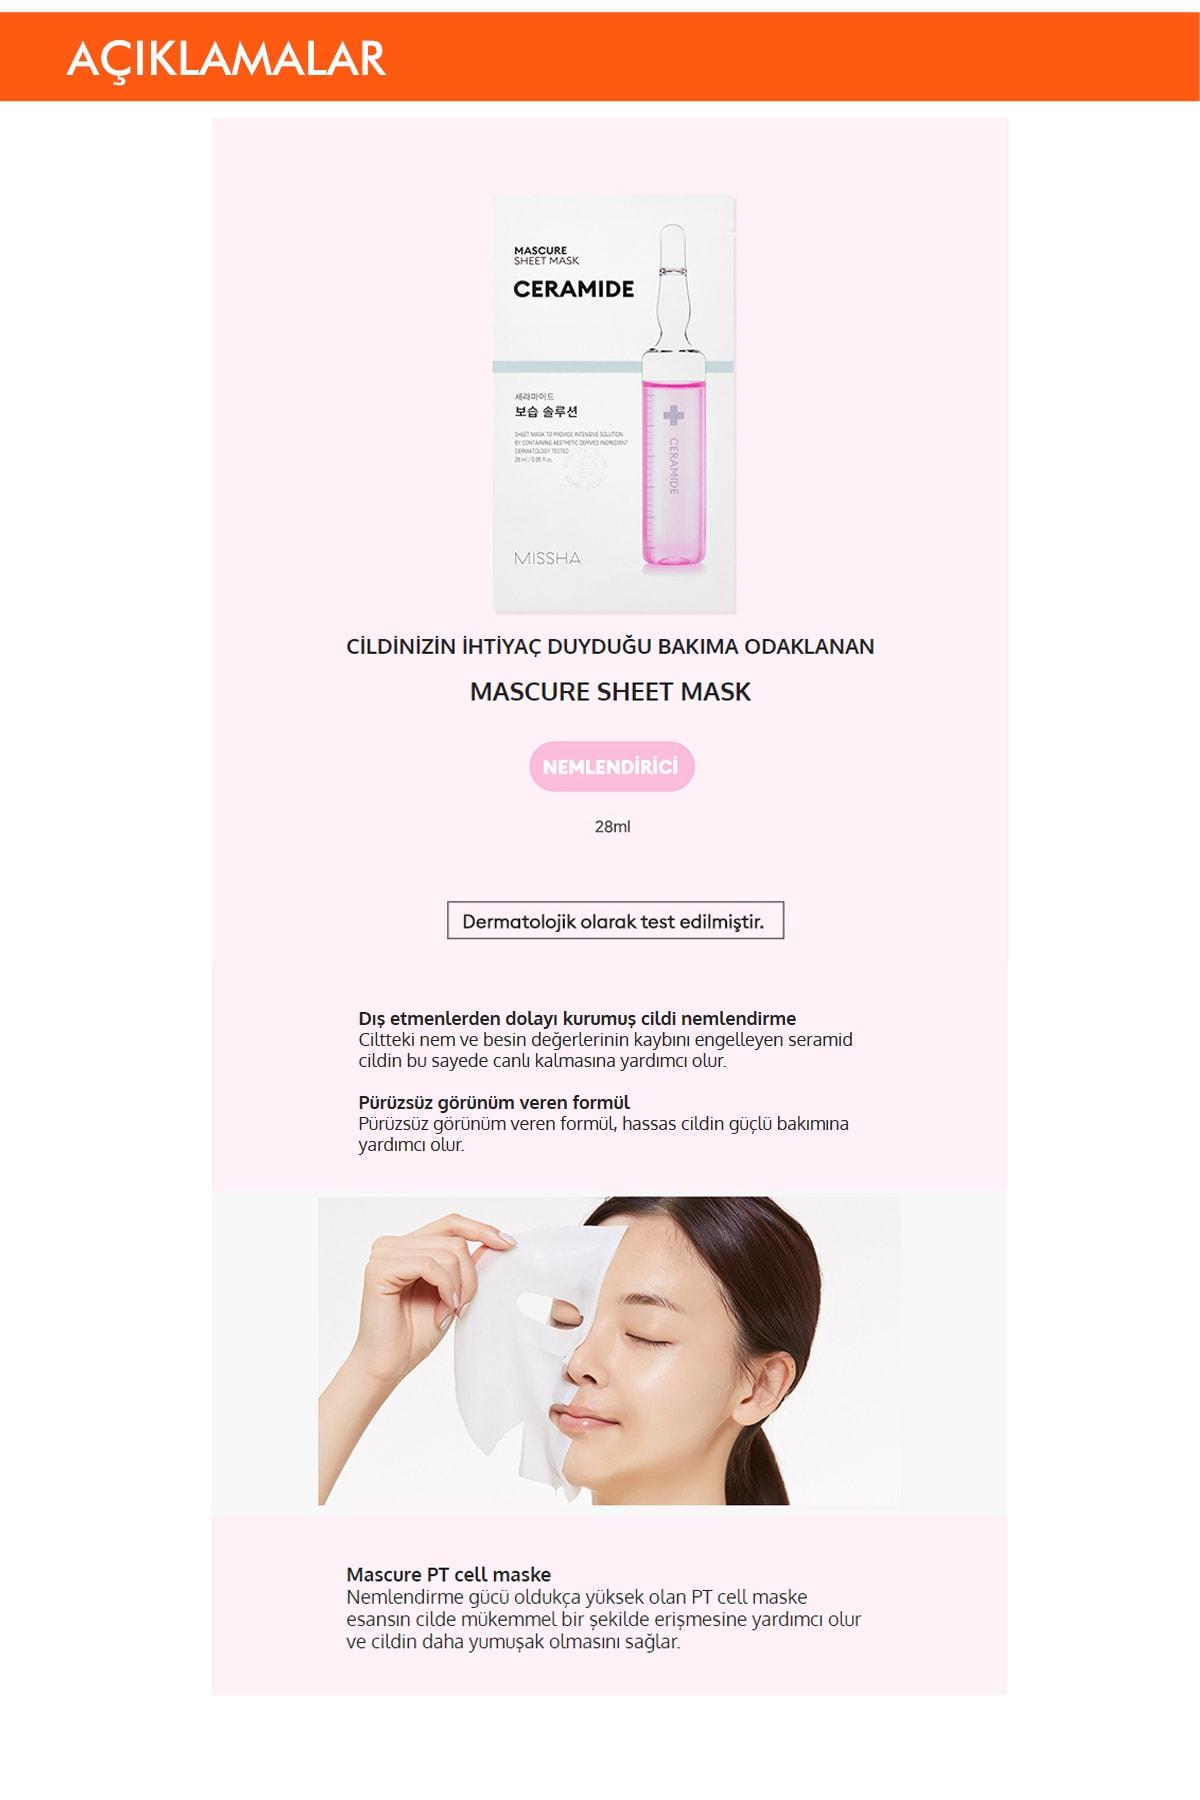 Missha Seramid Cilt Onarıcı Yaprak Maske (1ad) Mascure Moisture Barrier Solution Sheet Mask 1